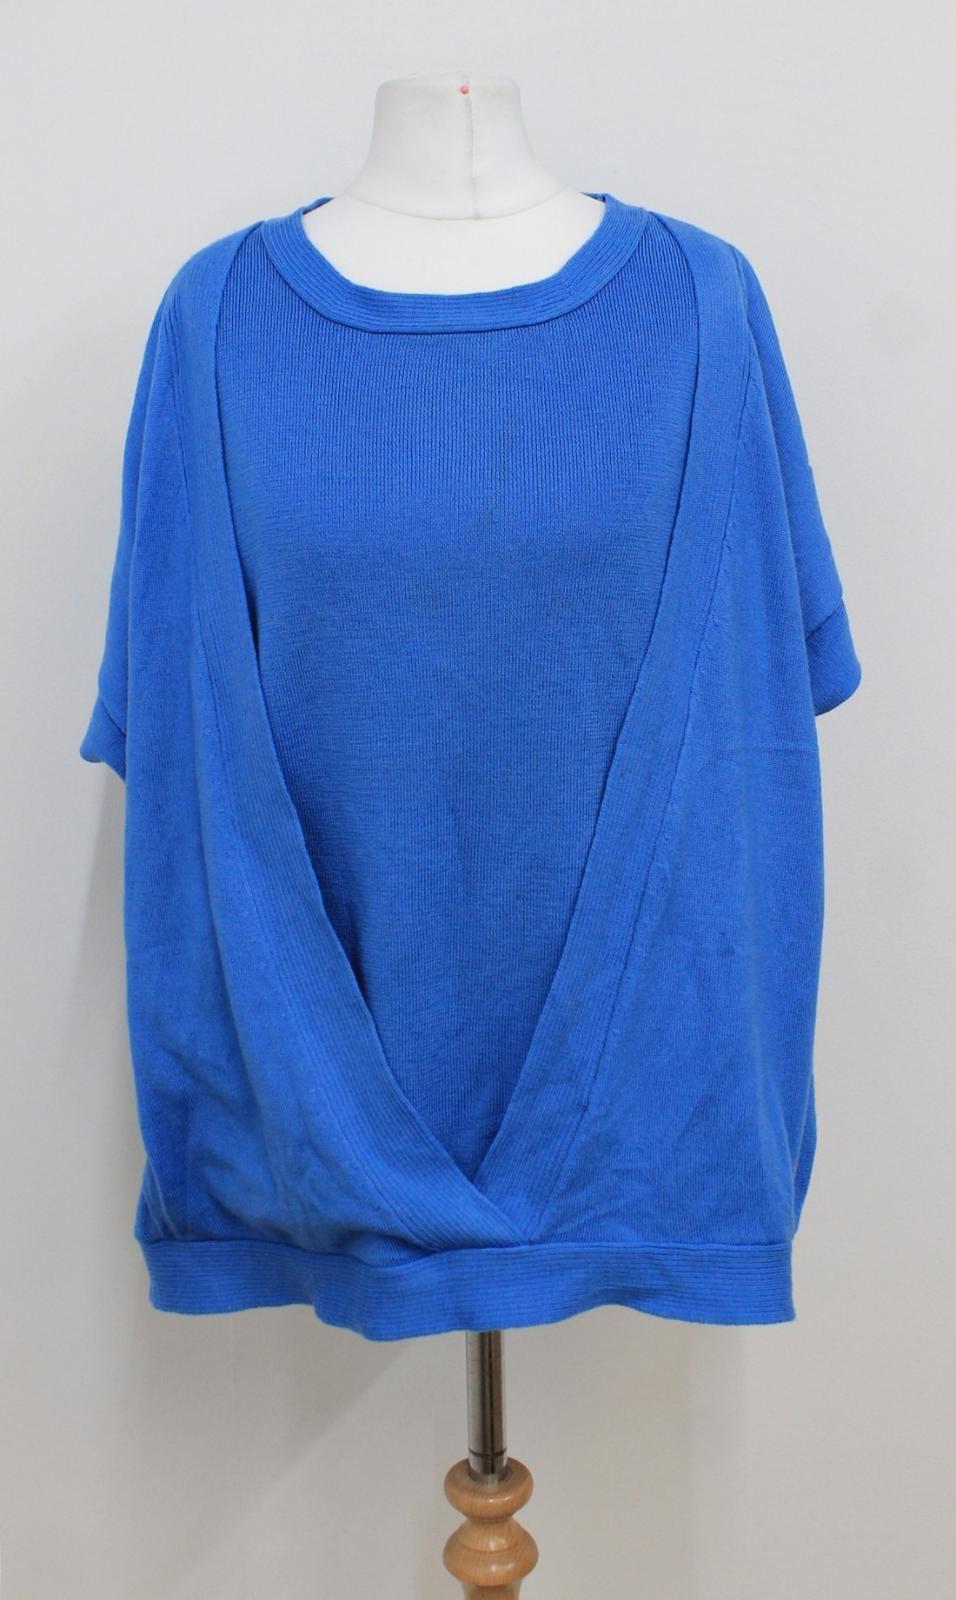 JAEGER-Ladies-Blue-Kimono-Sleeved-V-Neckline-Wool-Layered-Look-Top-Size-XL